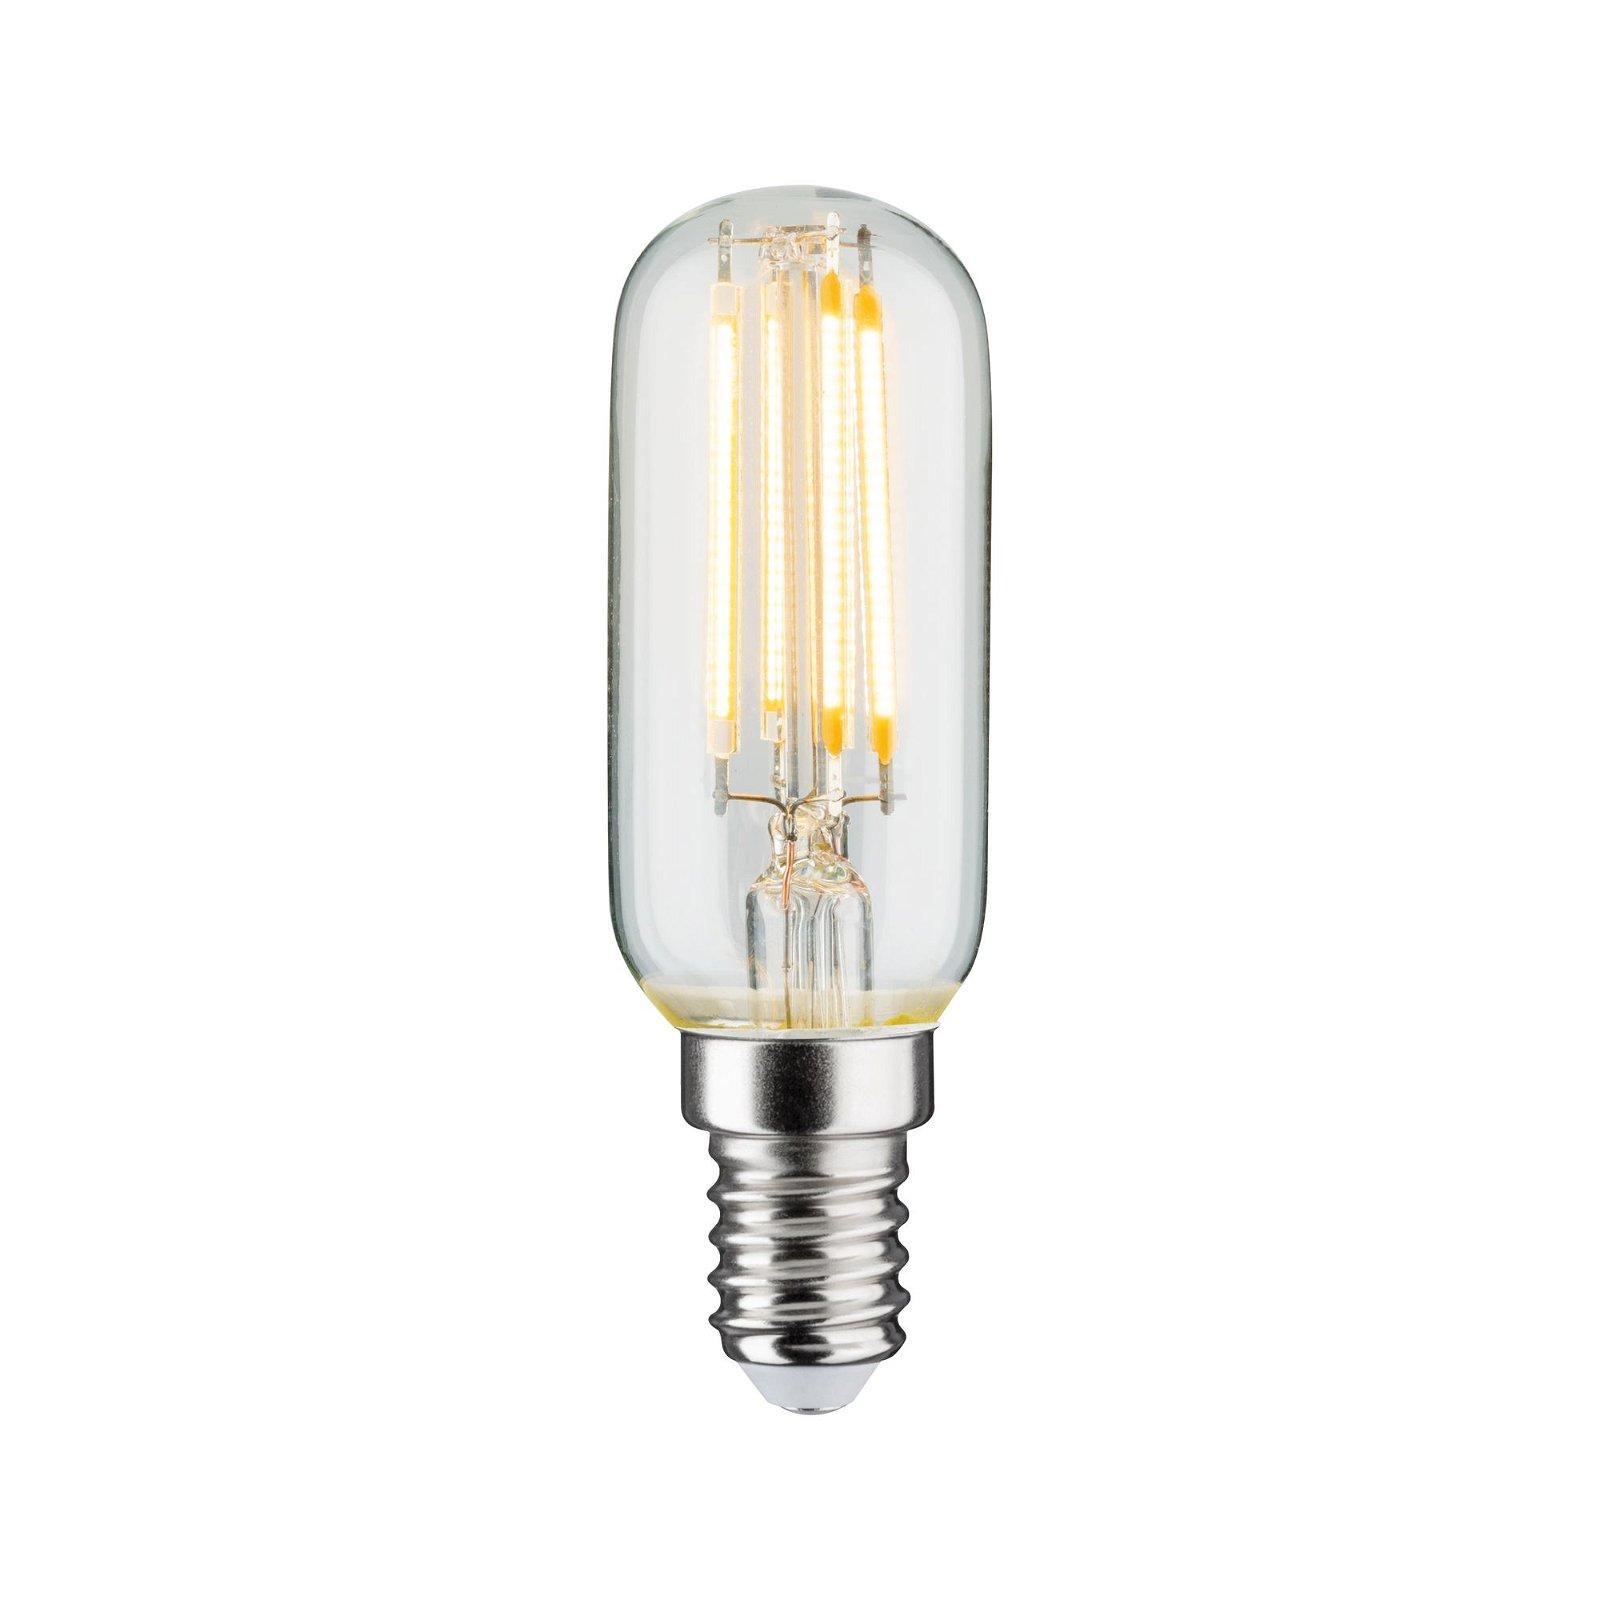 LED Röhre Filament E14 230V 470lm 4,8W 2700K Klar